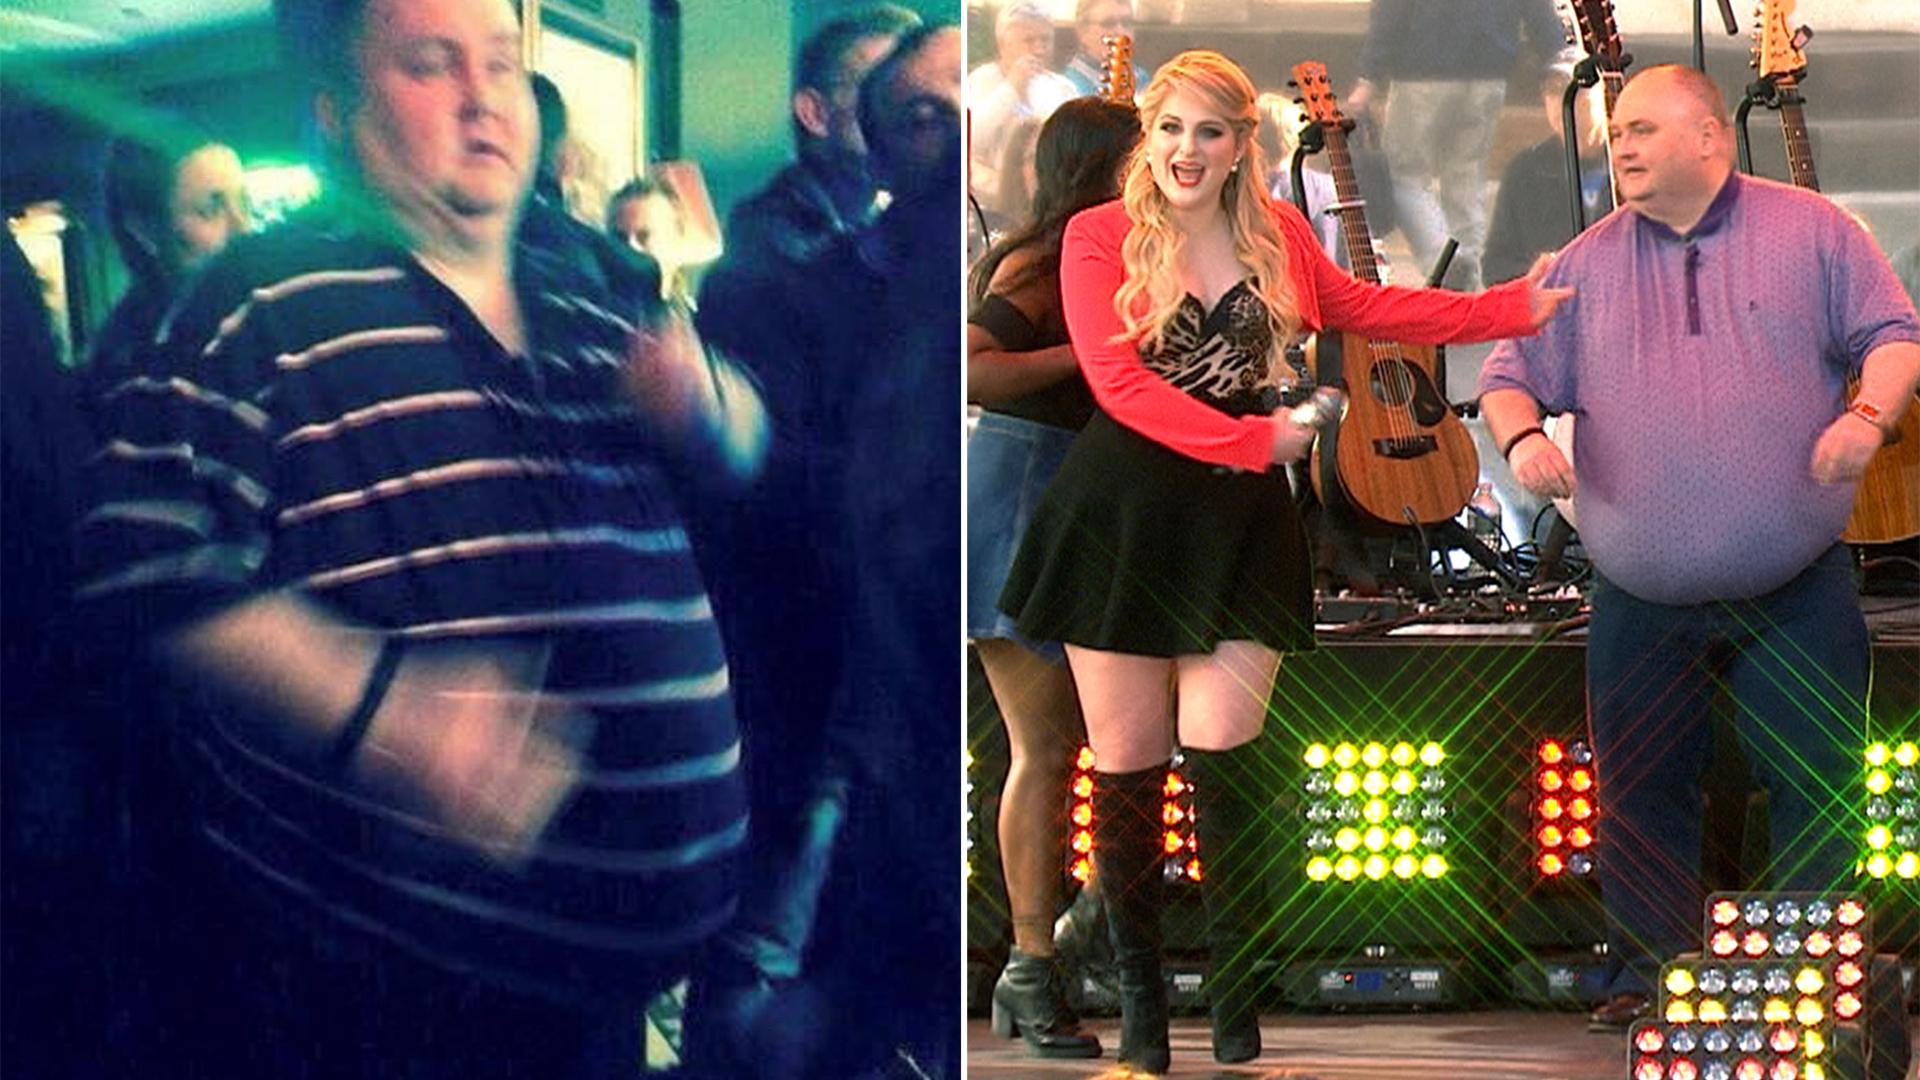 Fat Guy Stuck In Internet Boogie Baby Boogie 52